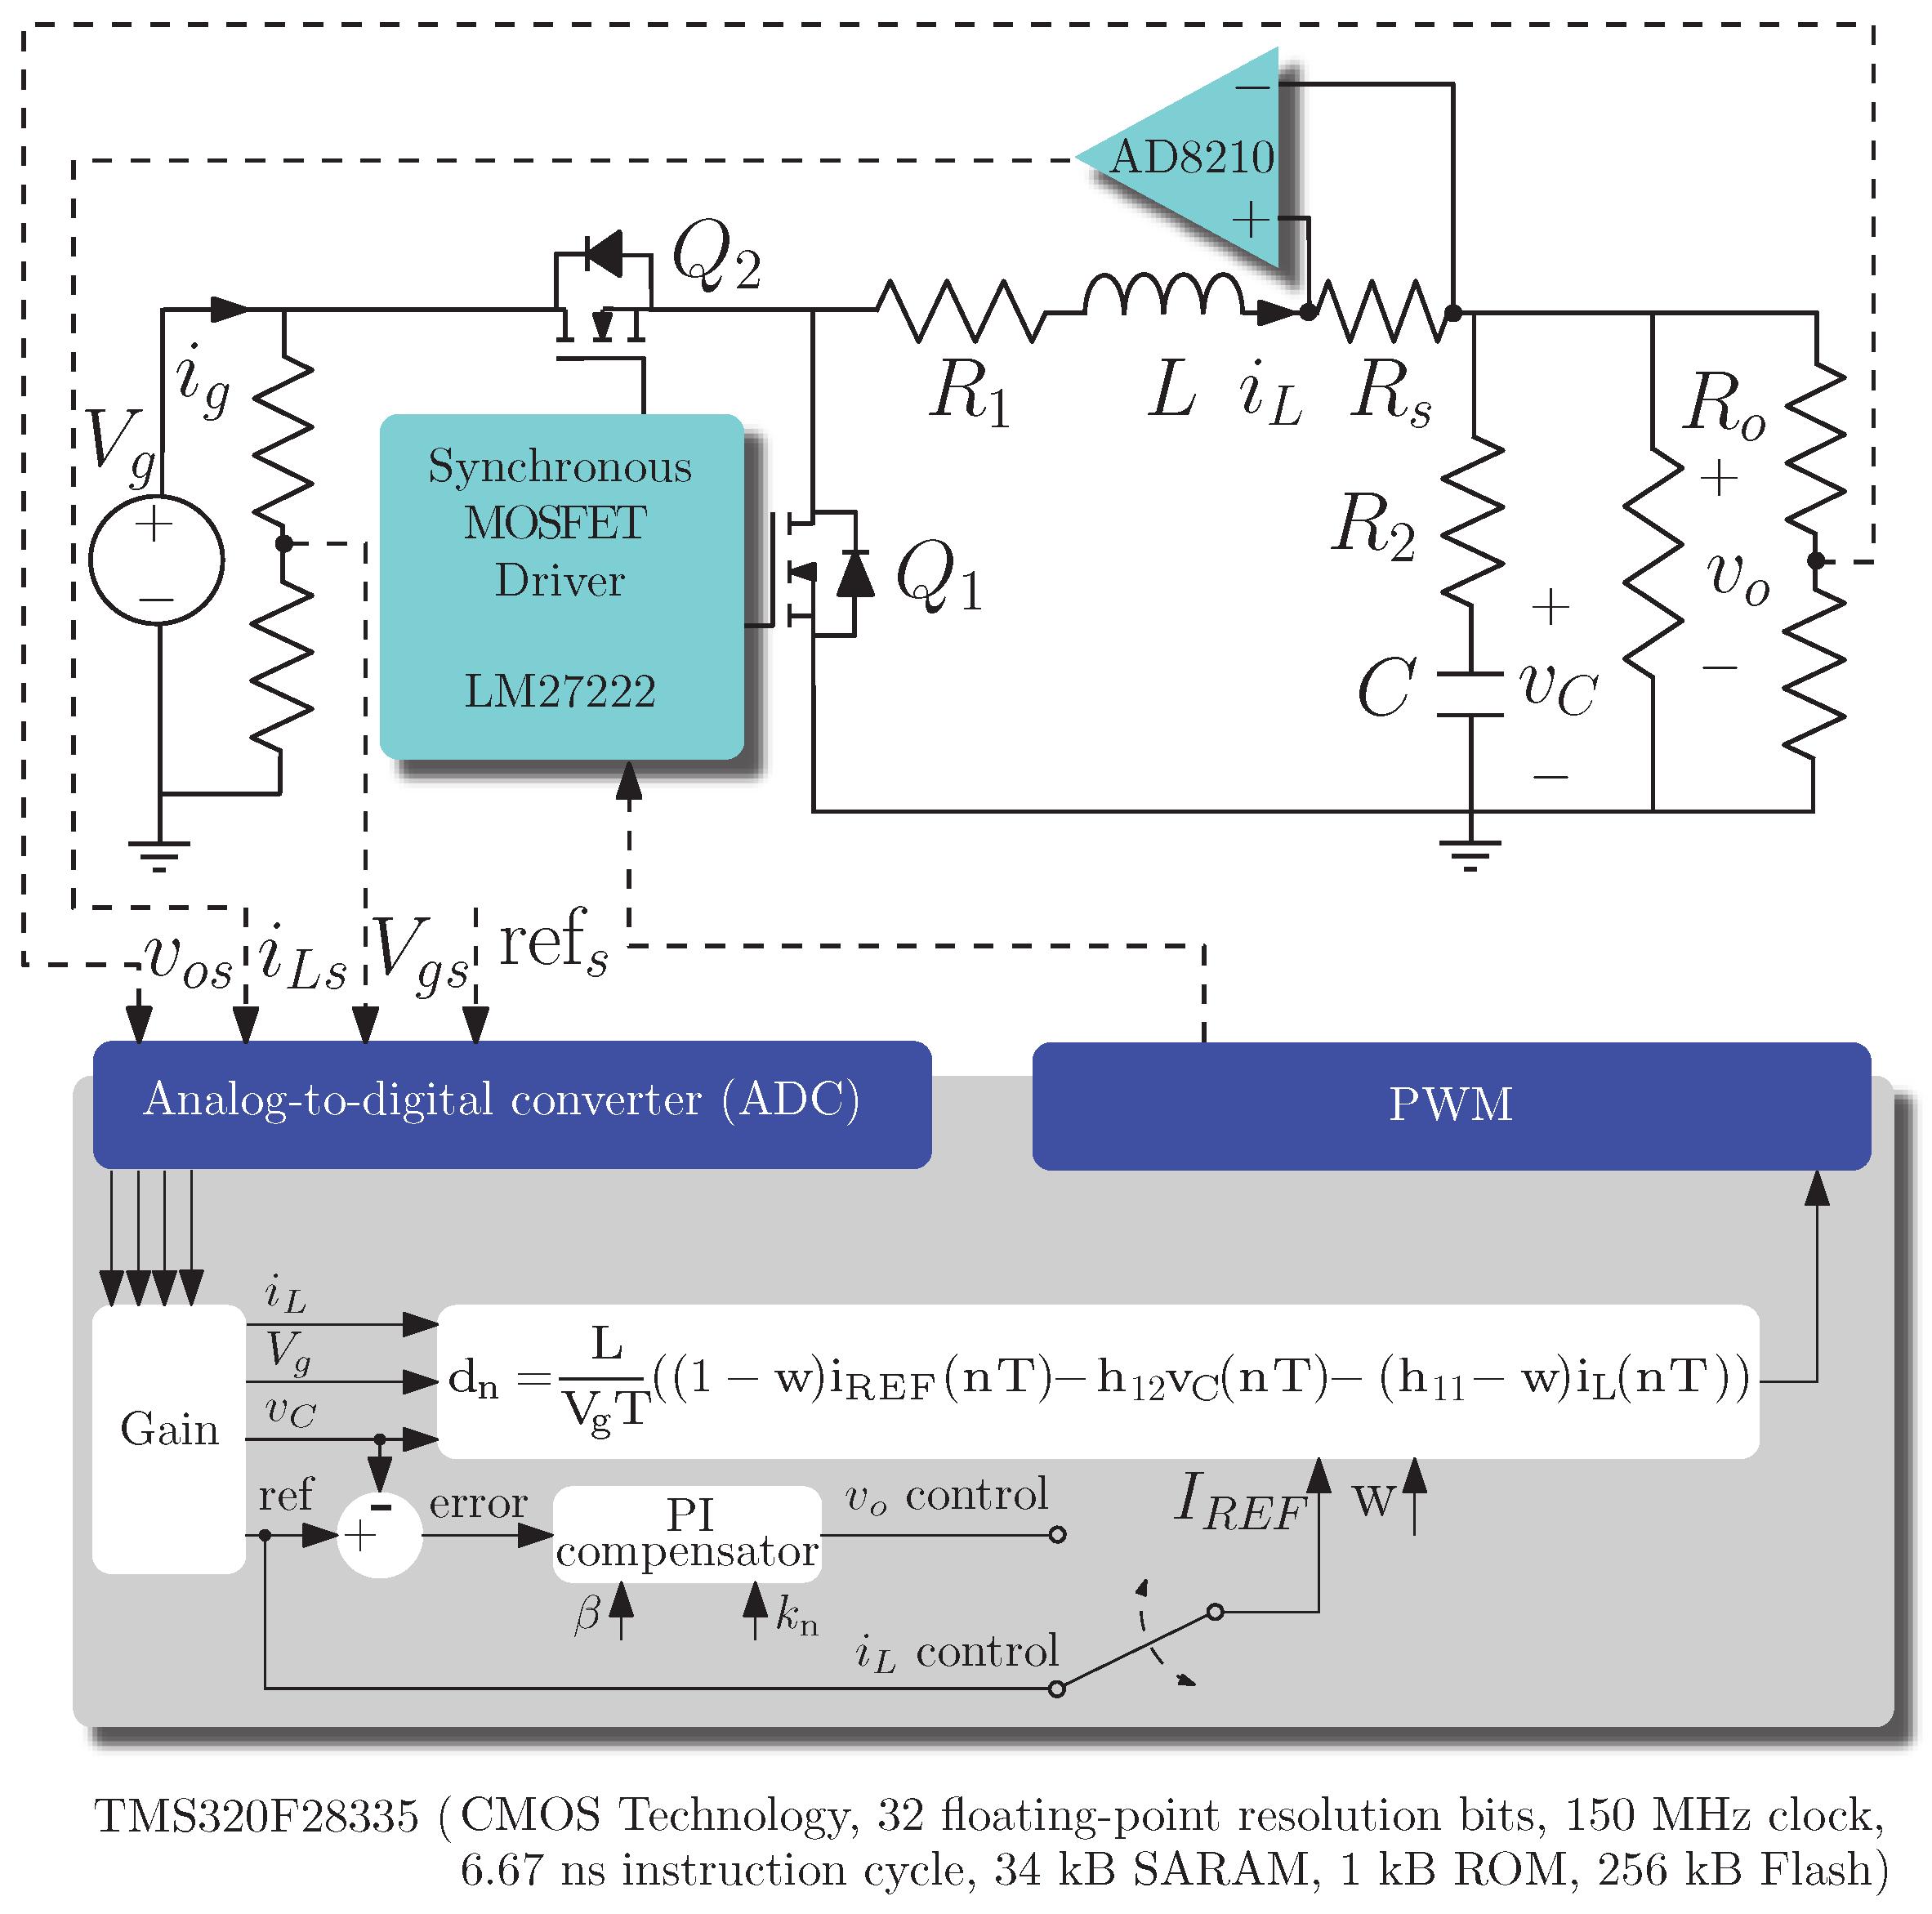 Energies | Free Full-Text | Digital Control of a Buck Converter